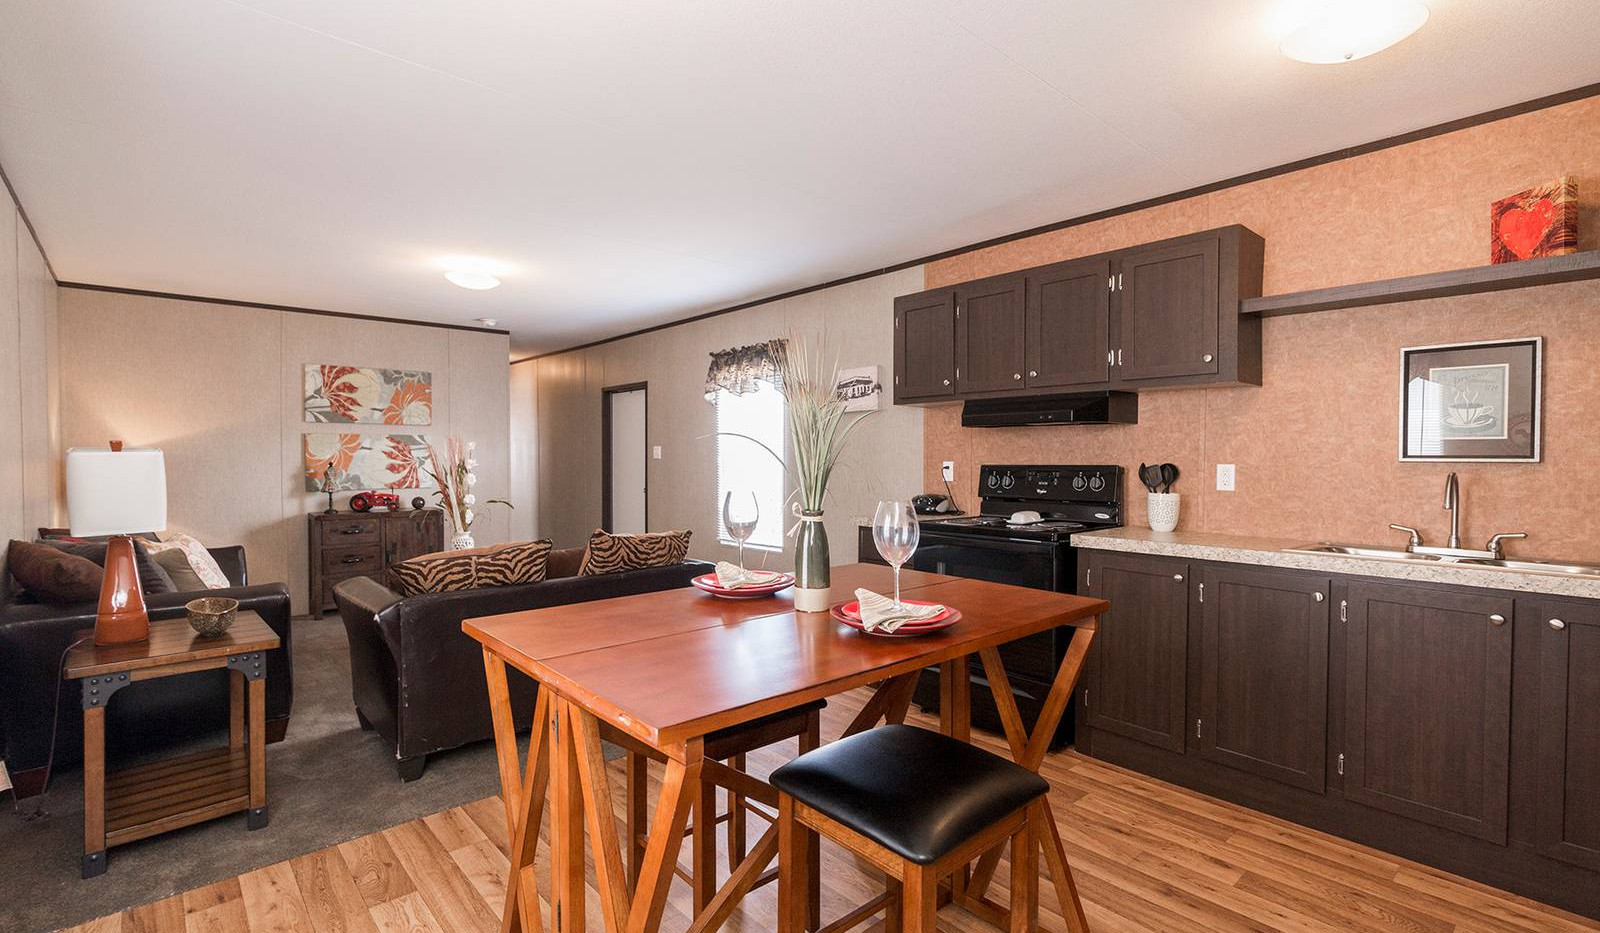 1-redman-1466a-dining-area-kitchen-livin